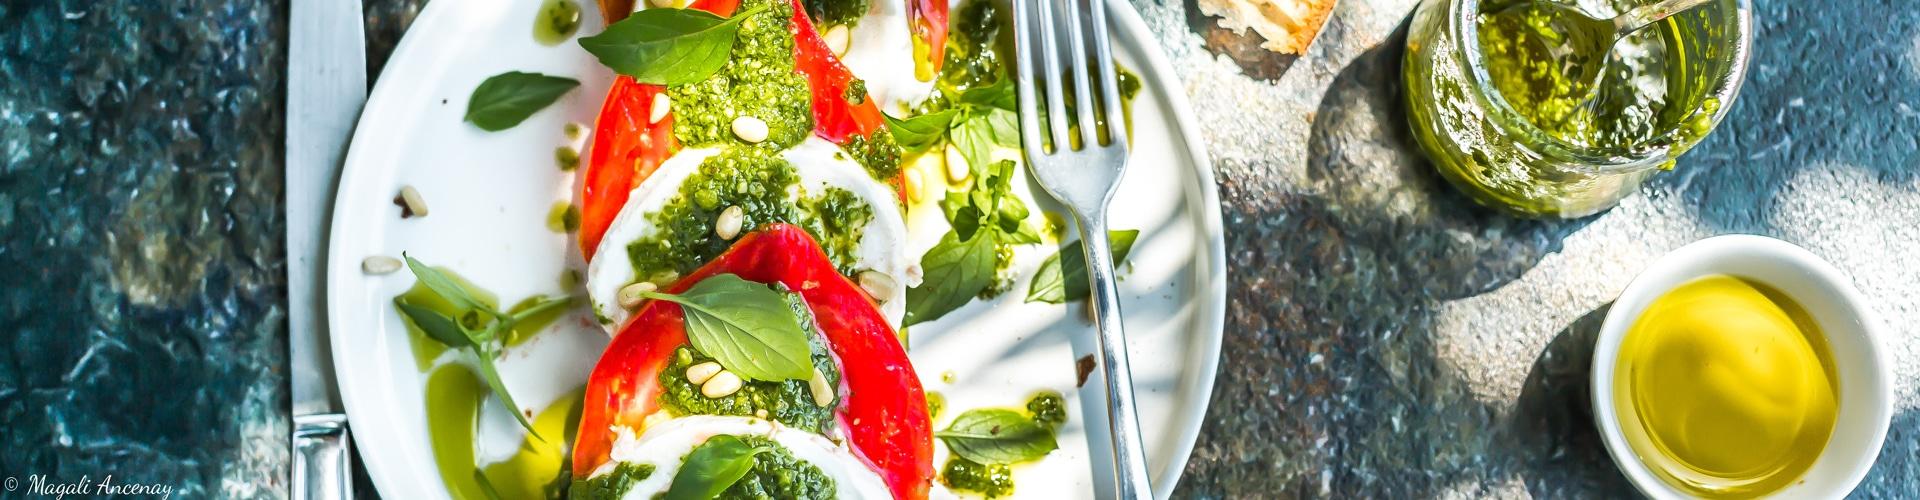 huile-olive-france-salade-tomates-mozzarella-pesto-basilic